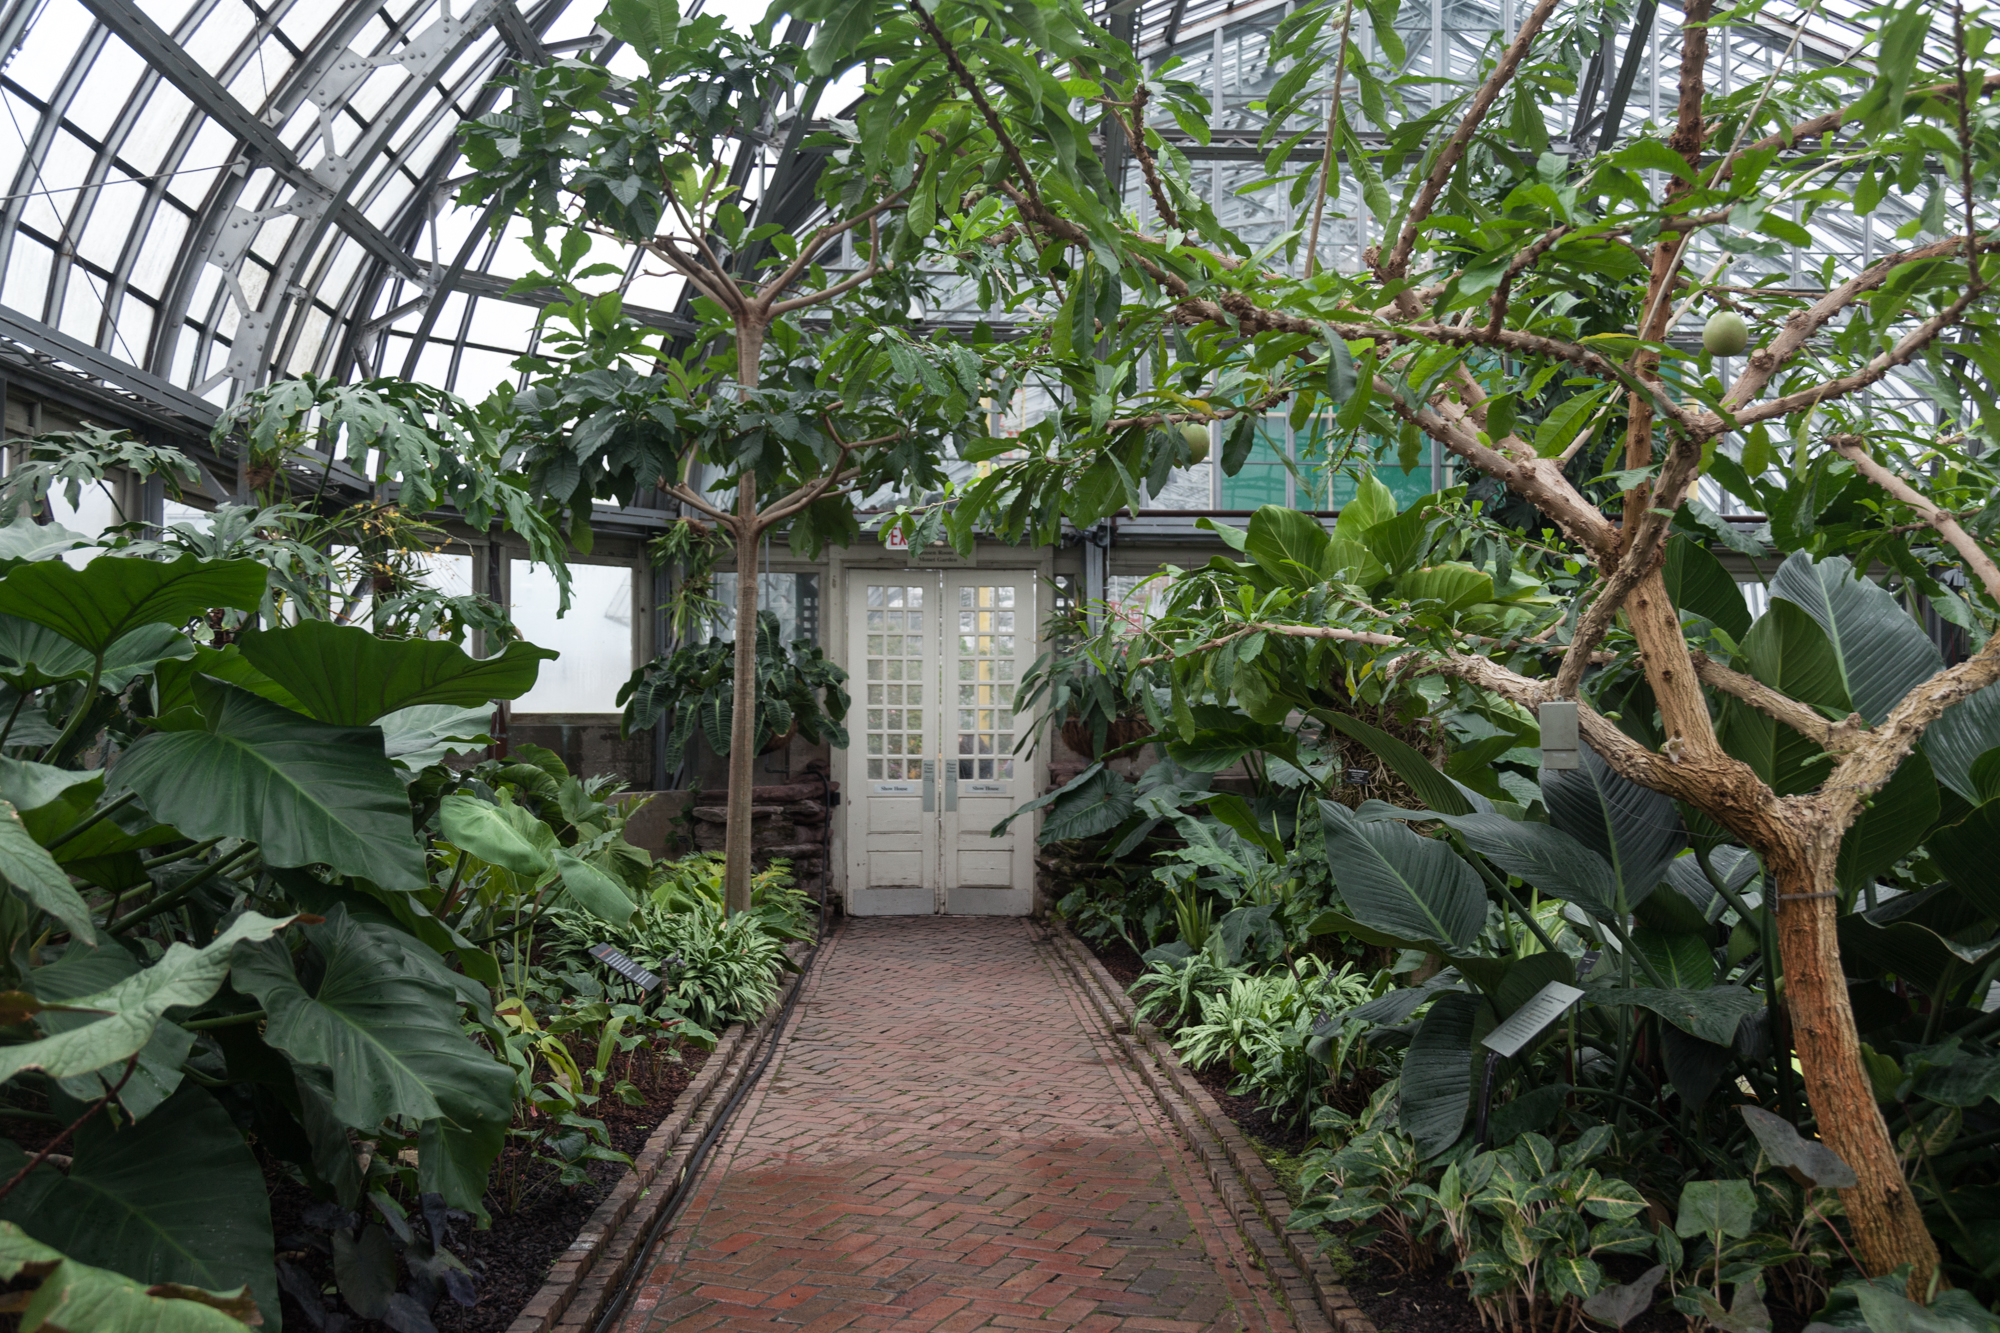 Aroid-House-Garfield-Park-Conservatory-Homestead-Brooklyn.jpg